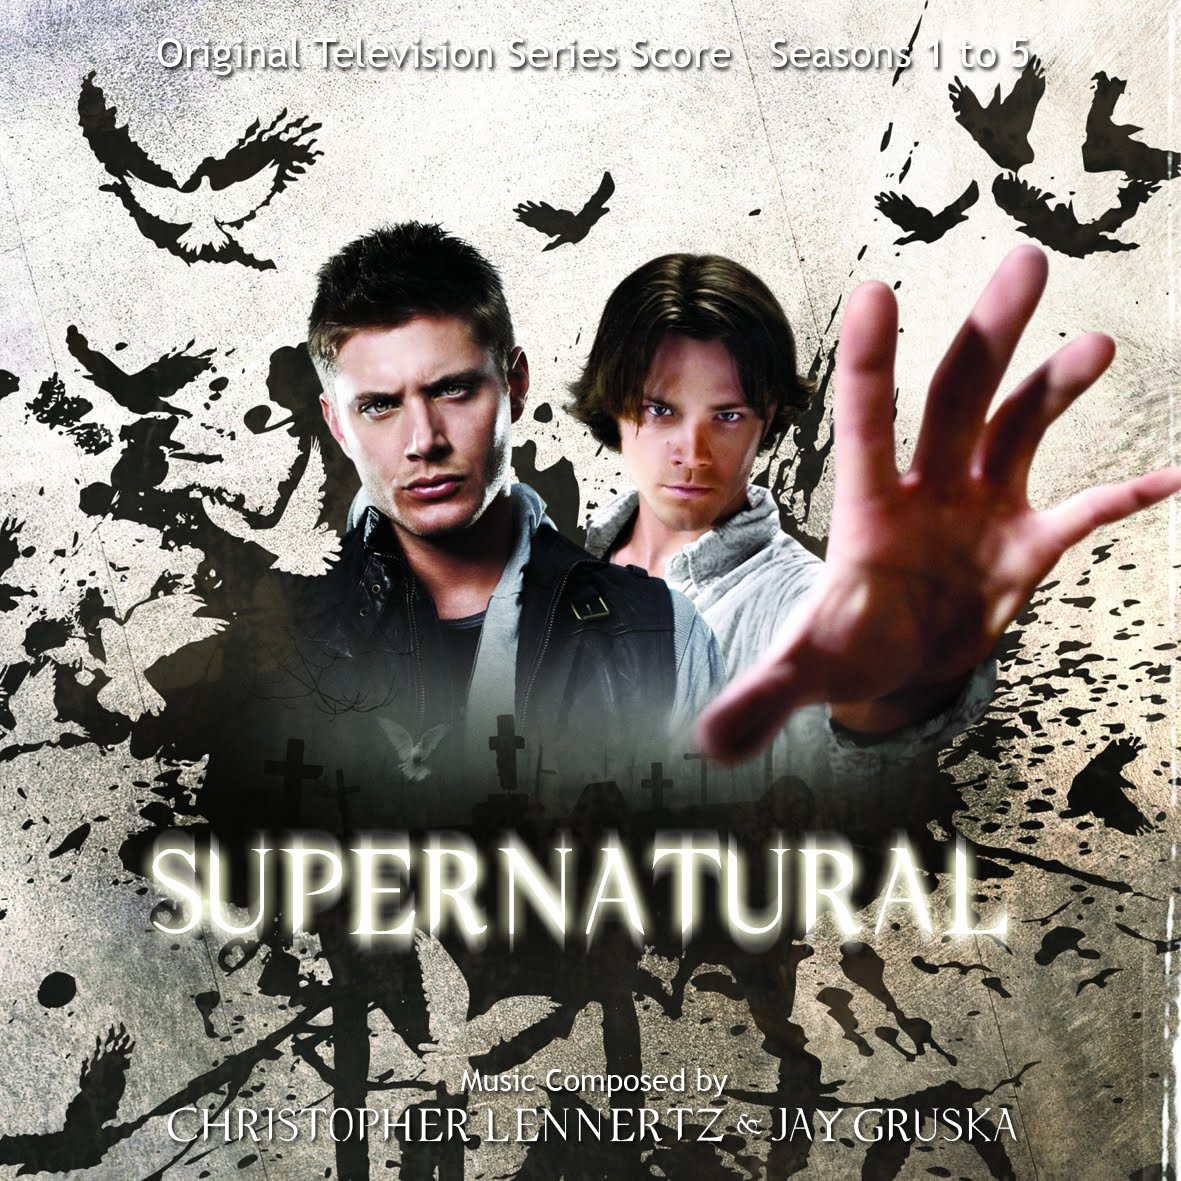 Soundtrack List Covers: Supernatural (Christopher Lennertz & Jay Gruska)